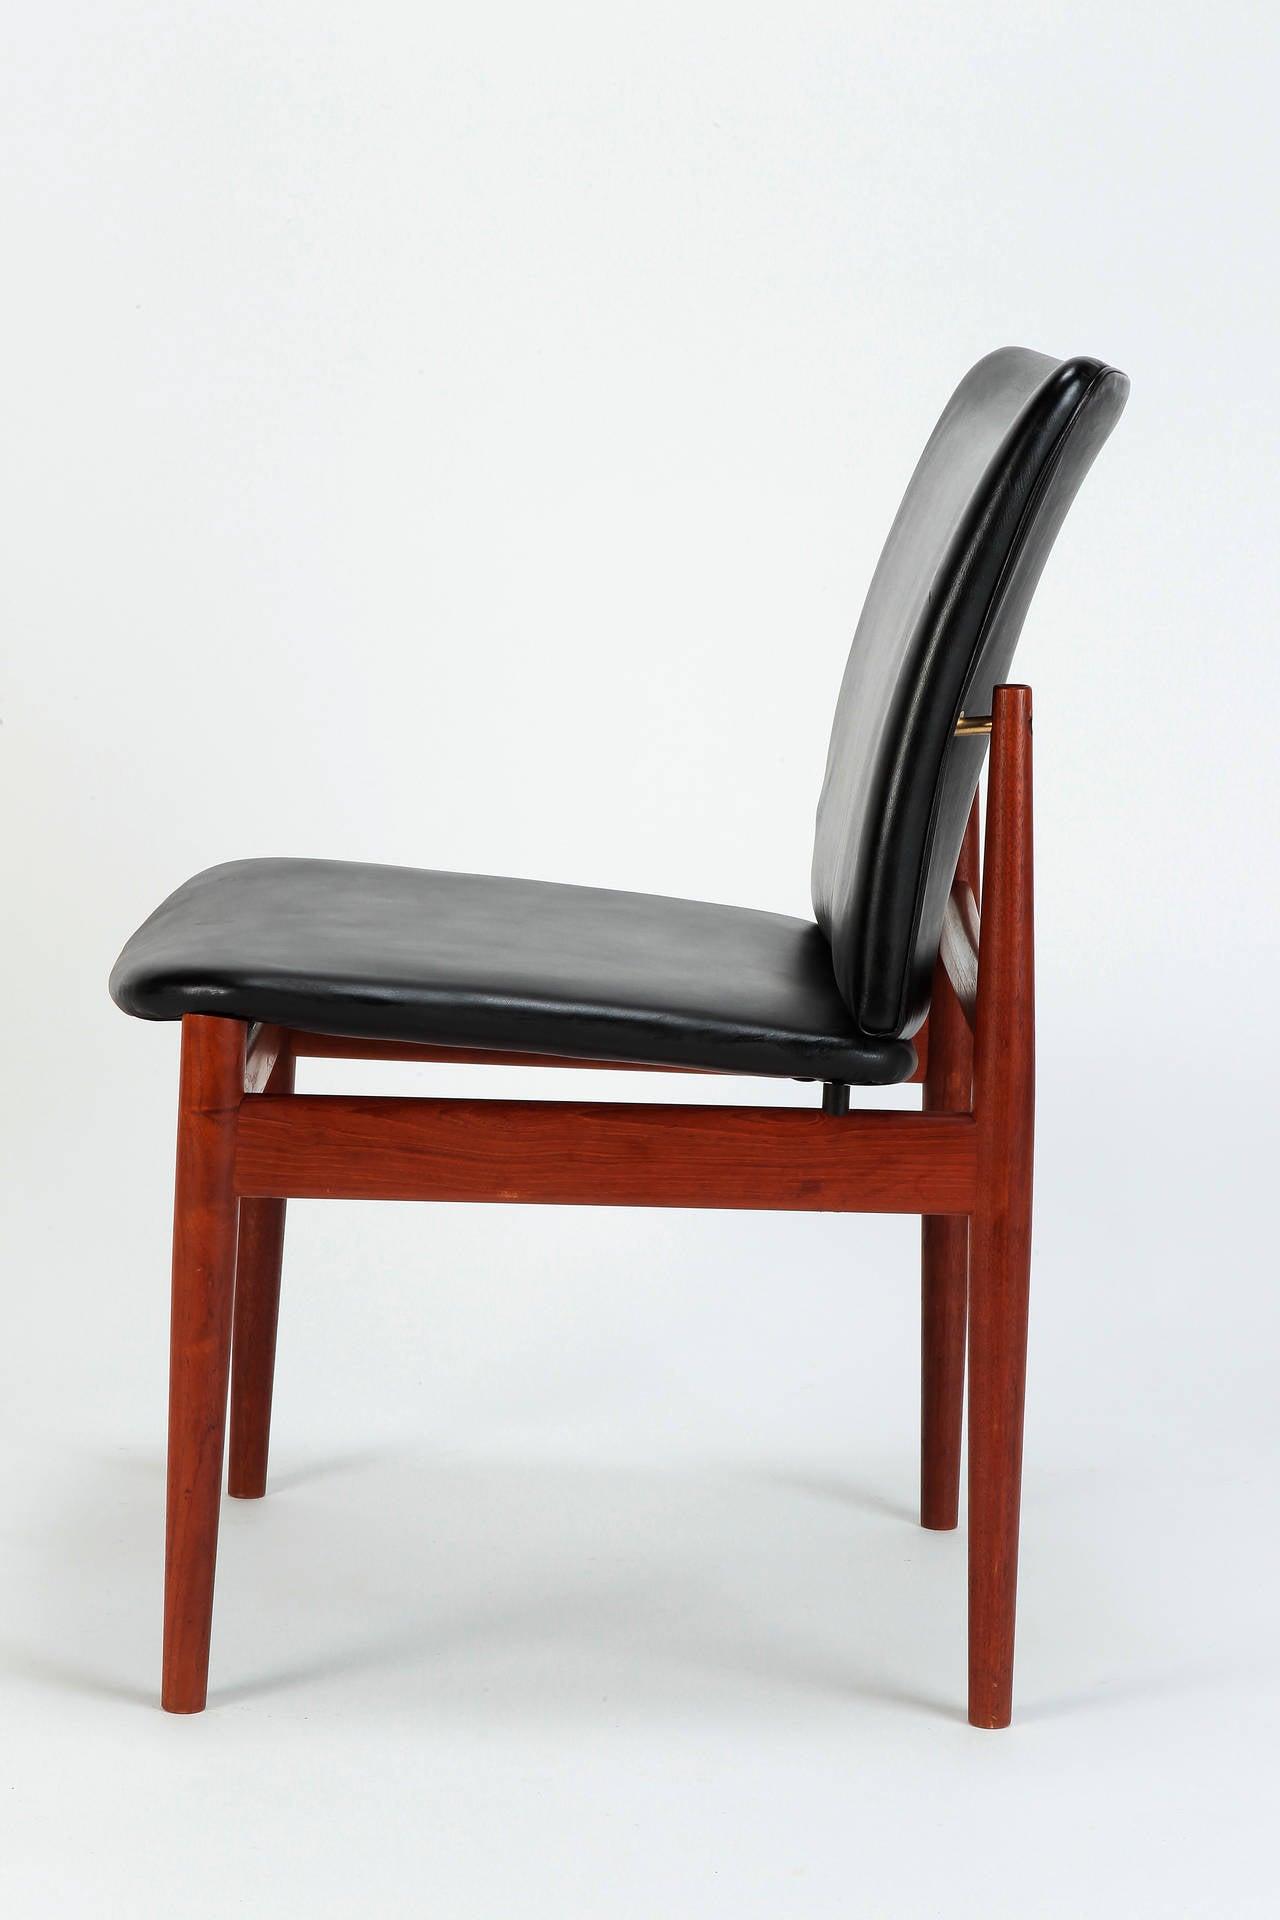 Danish Teak Leather Chair Model 191 by Finn Juhl 2Danish Teak Leather Chair Model 191 by Finn Juhl at 1stdibs. Finn Juhl Chair 108. Home Design Ideas